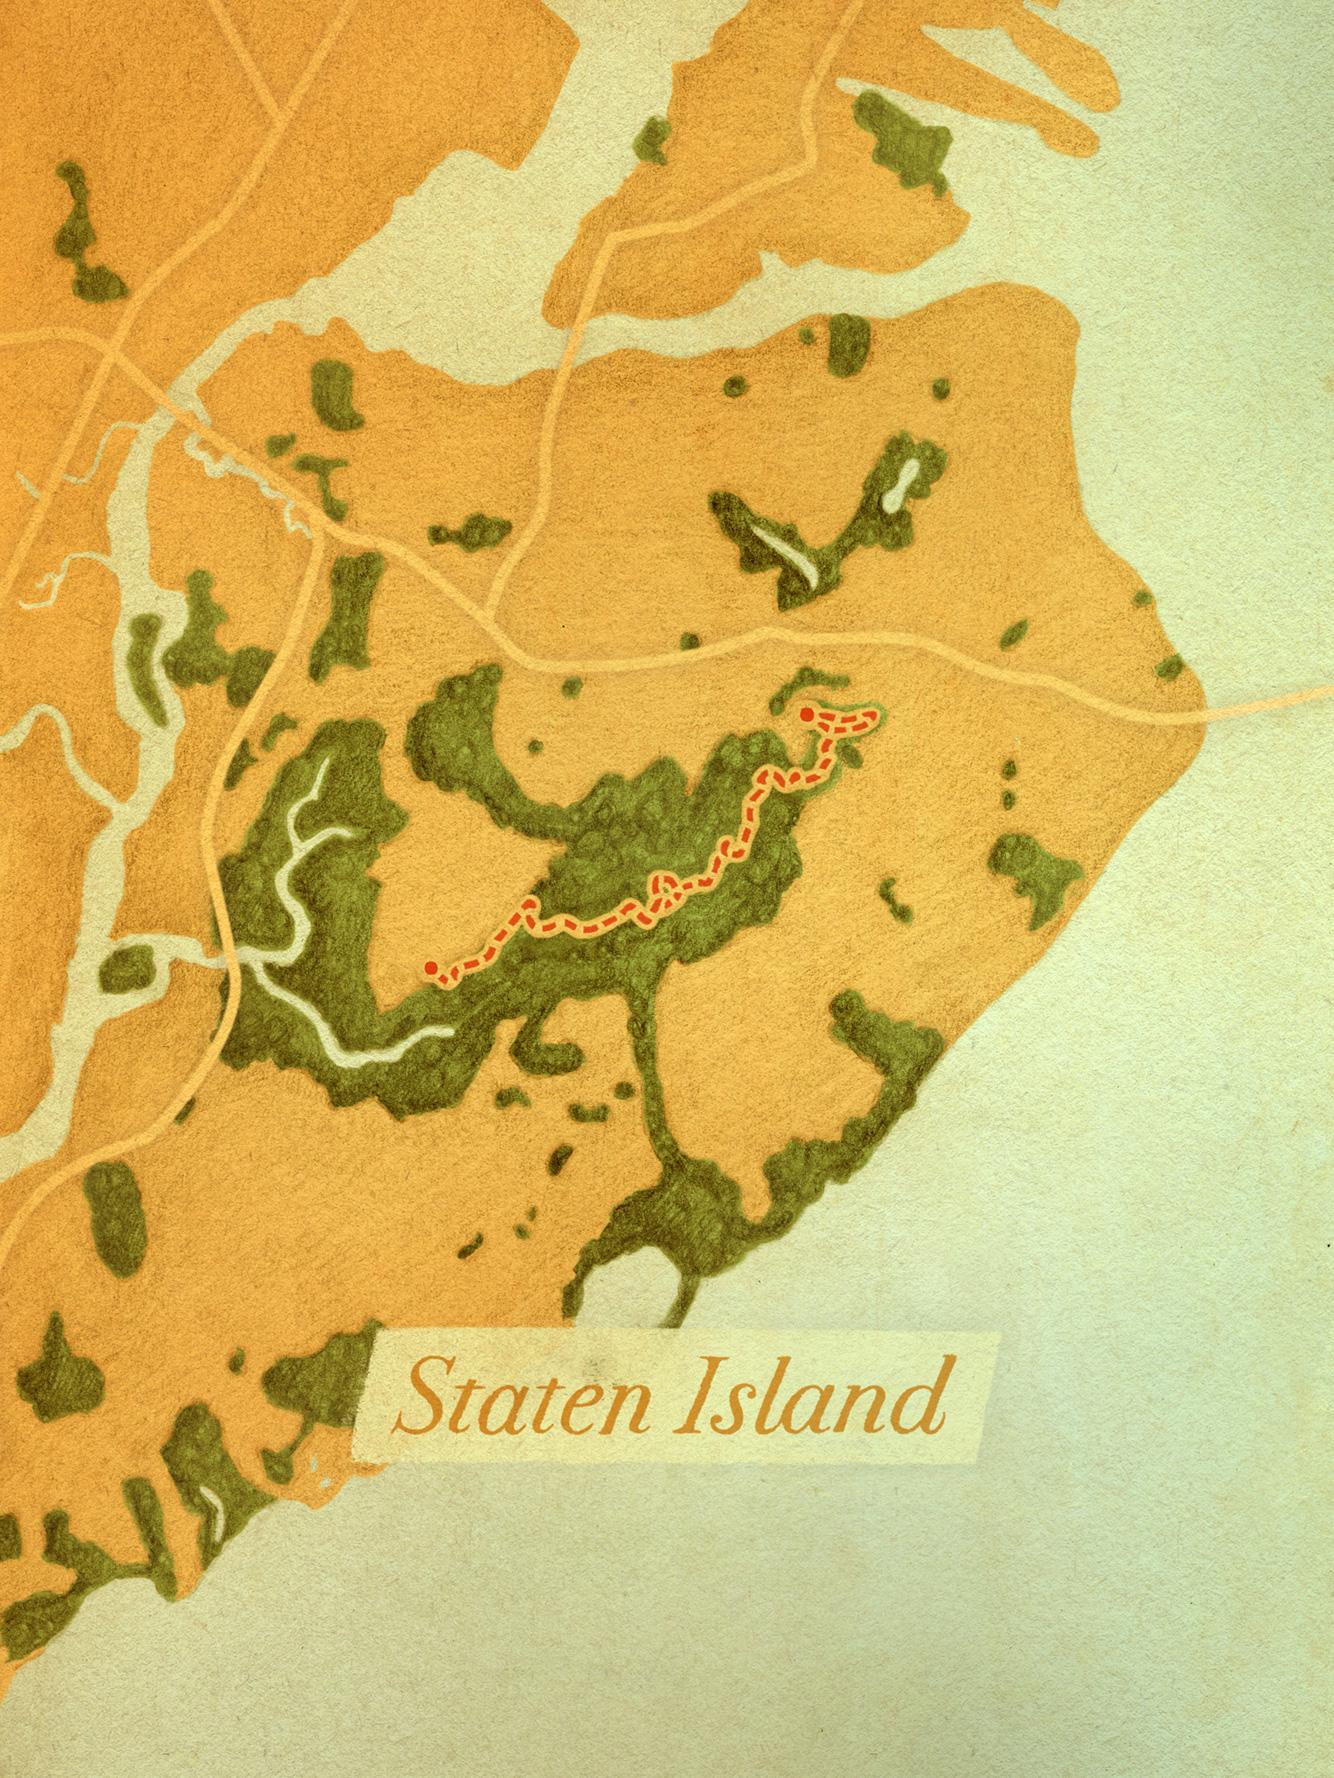 Yellow Trail of the Staten Island Greenbelt (Staten Island)